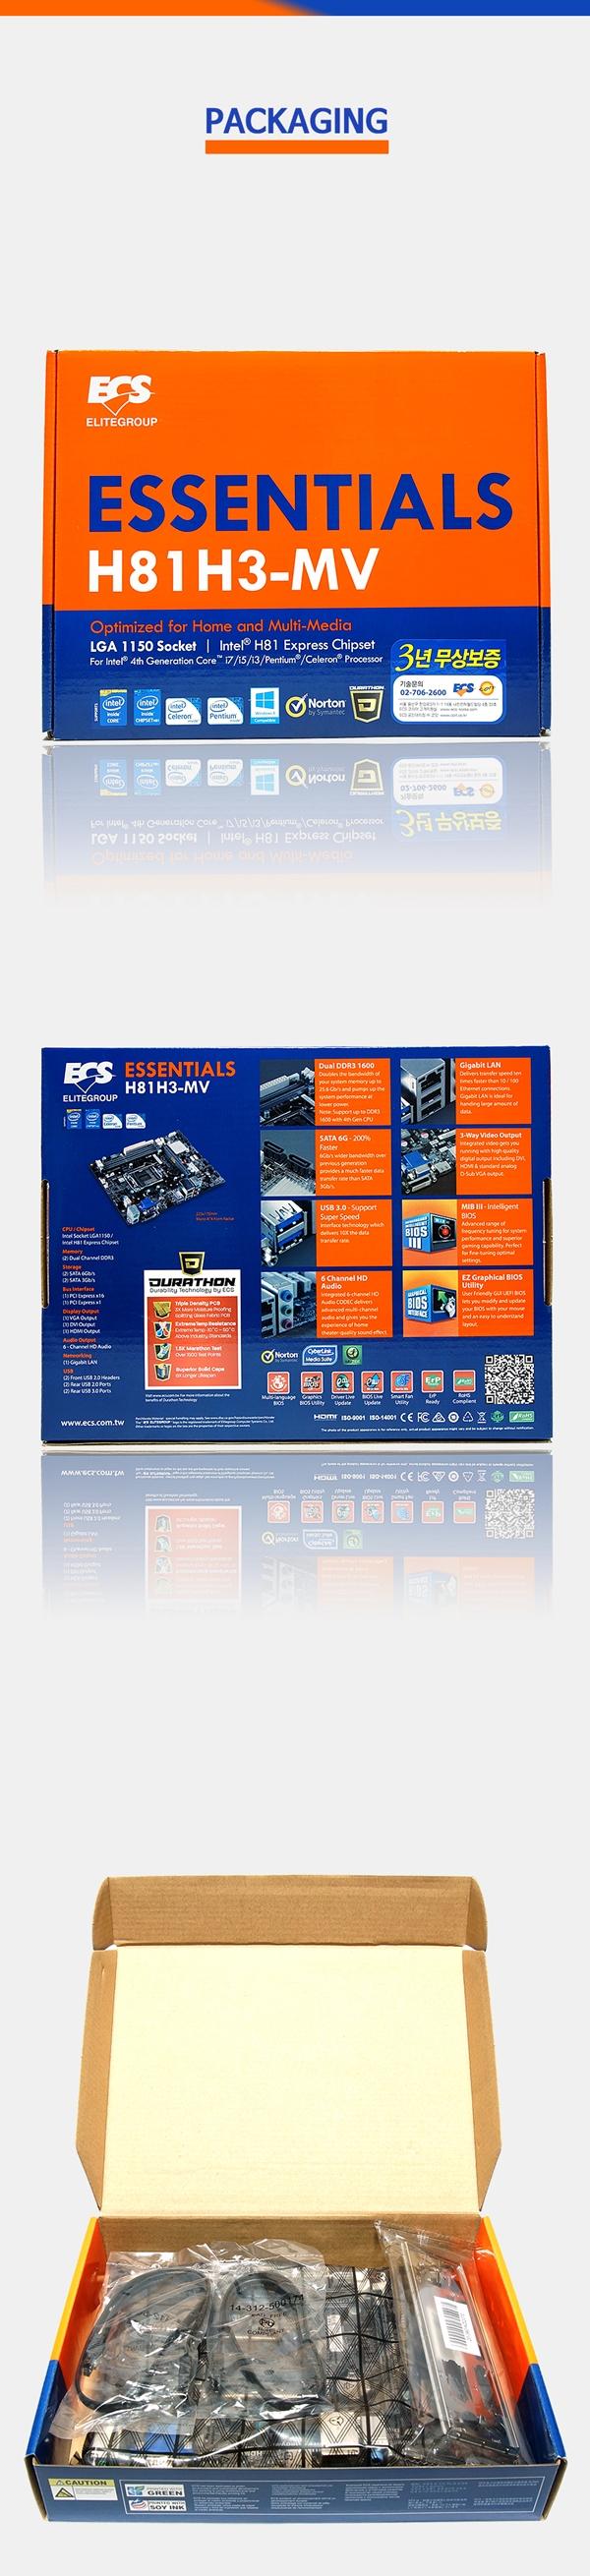 ECS H81H3 MV��Ű¡.jpg